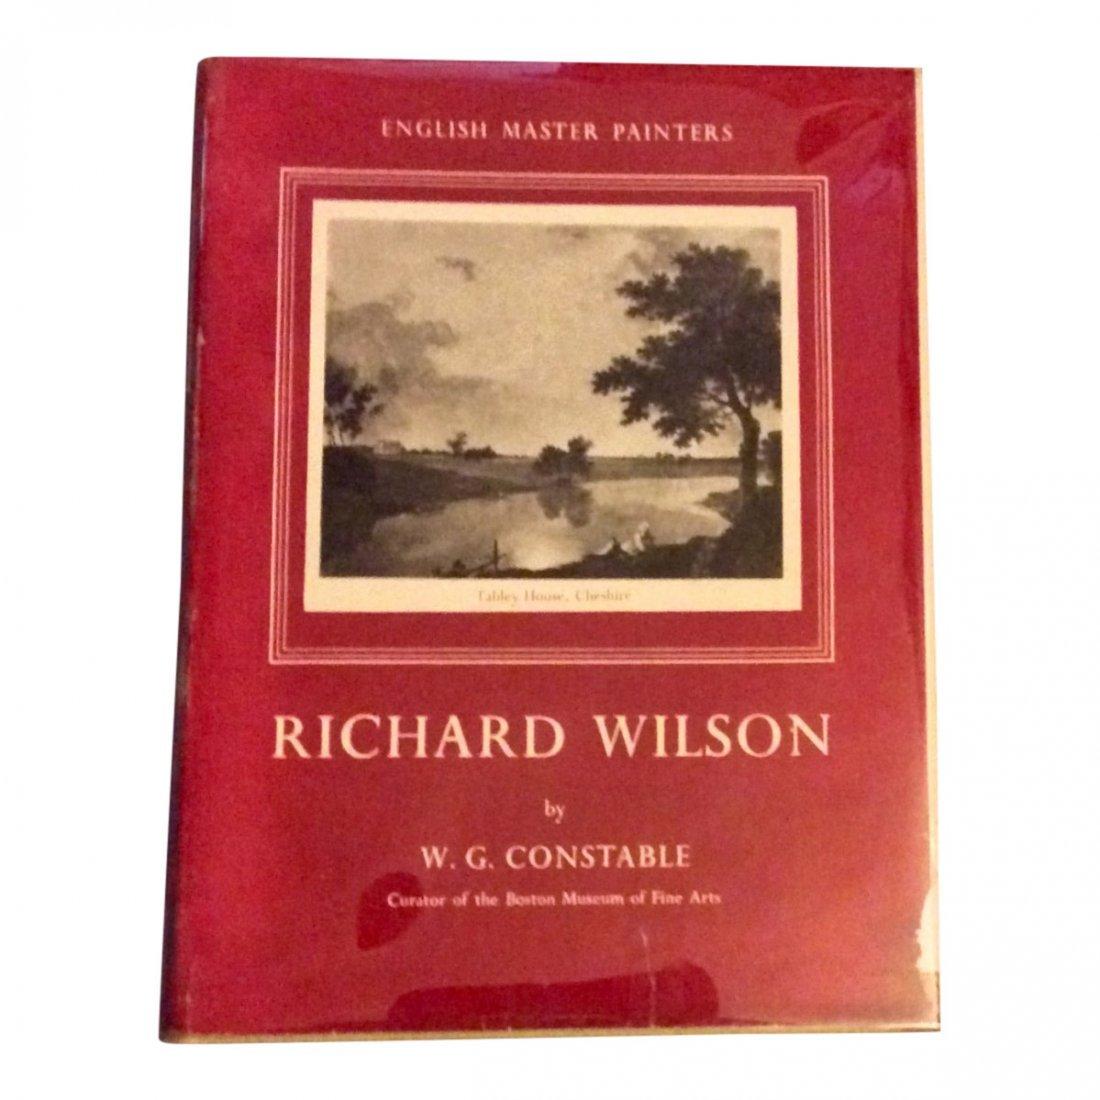 Vintage Biography of Painter Richard Wilson, 1953